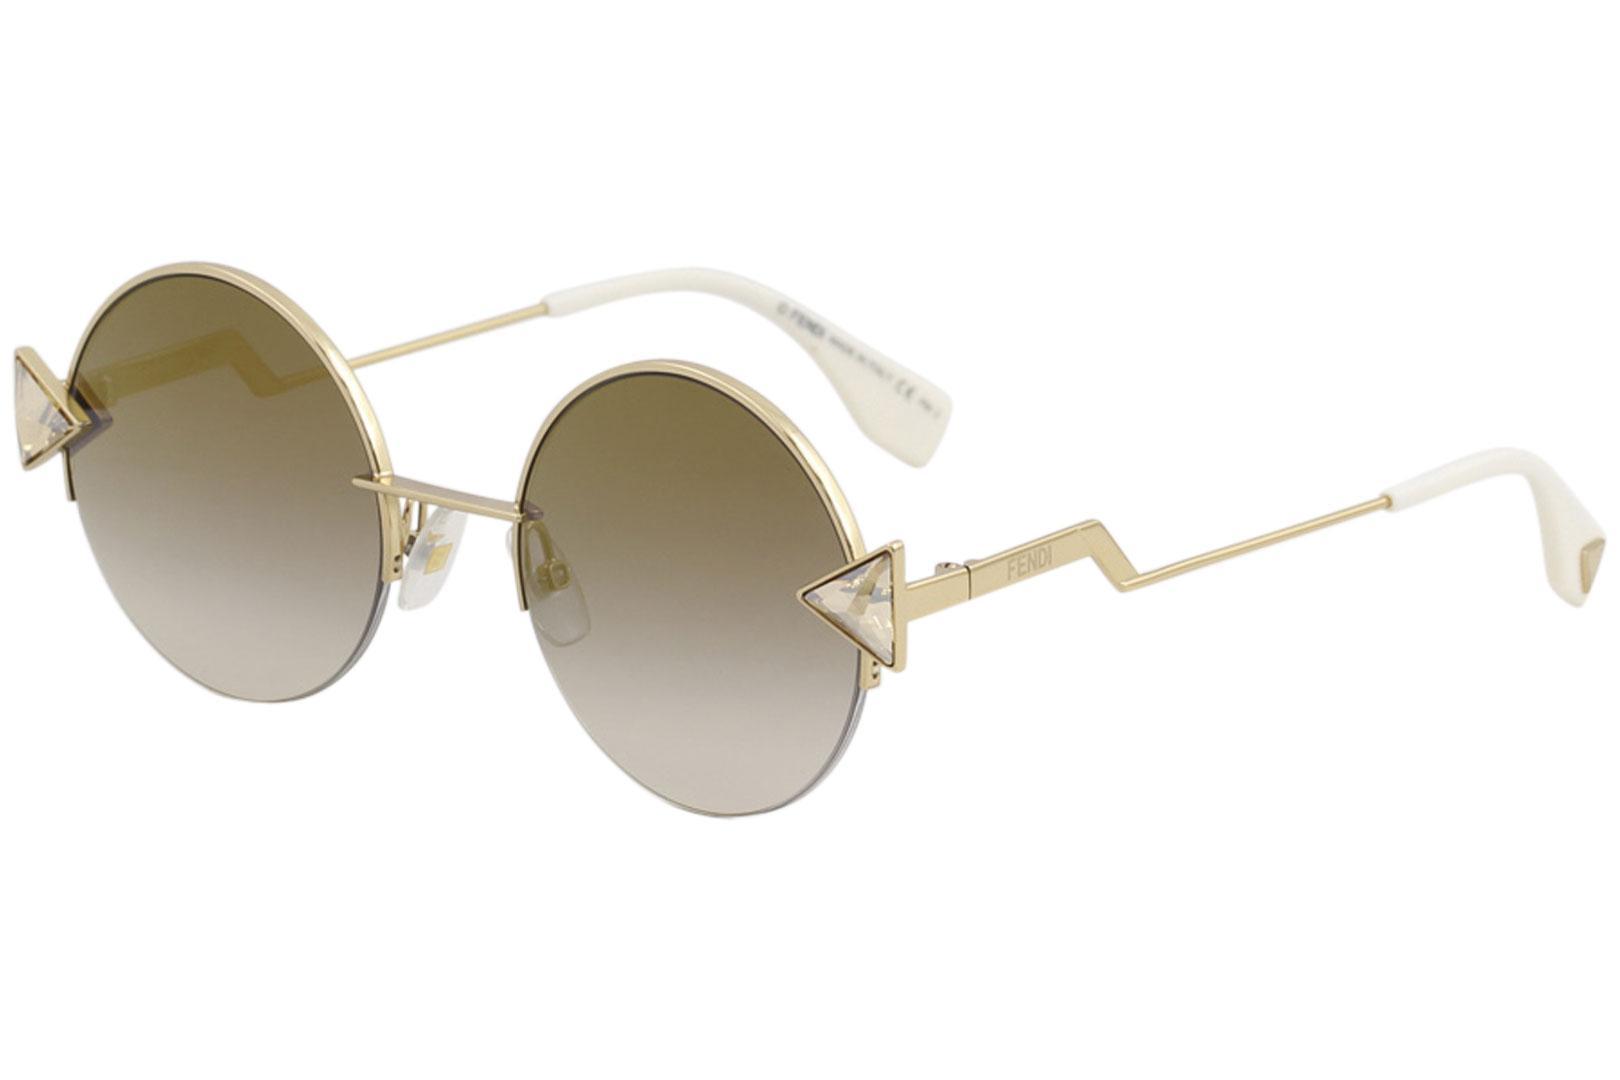 5320eb999290 Fendi Women s FF0243S FF 0243 S Fashion Round Sunglasses